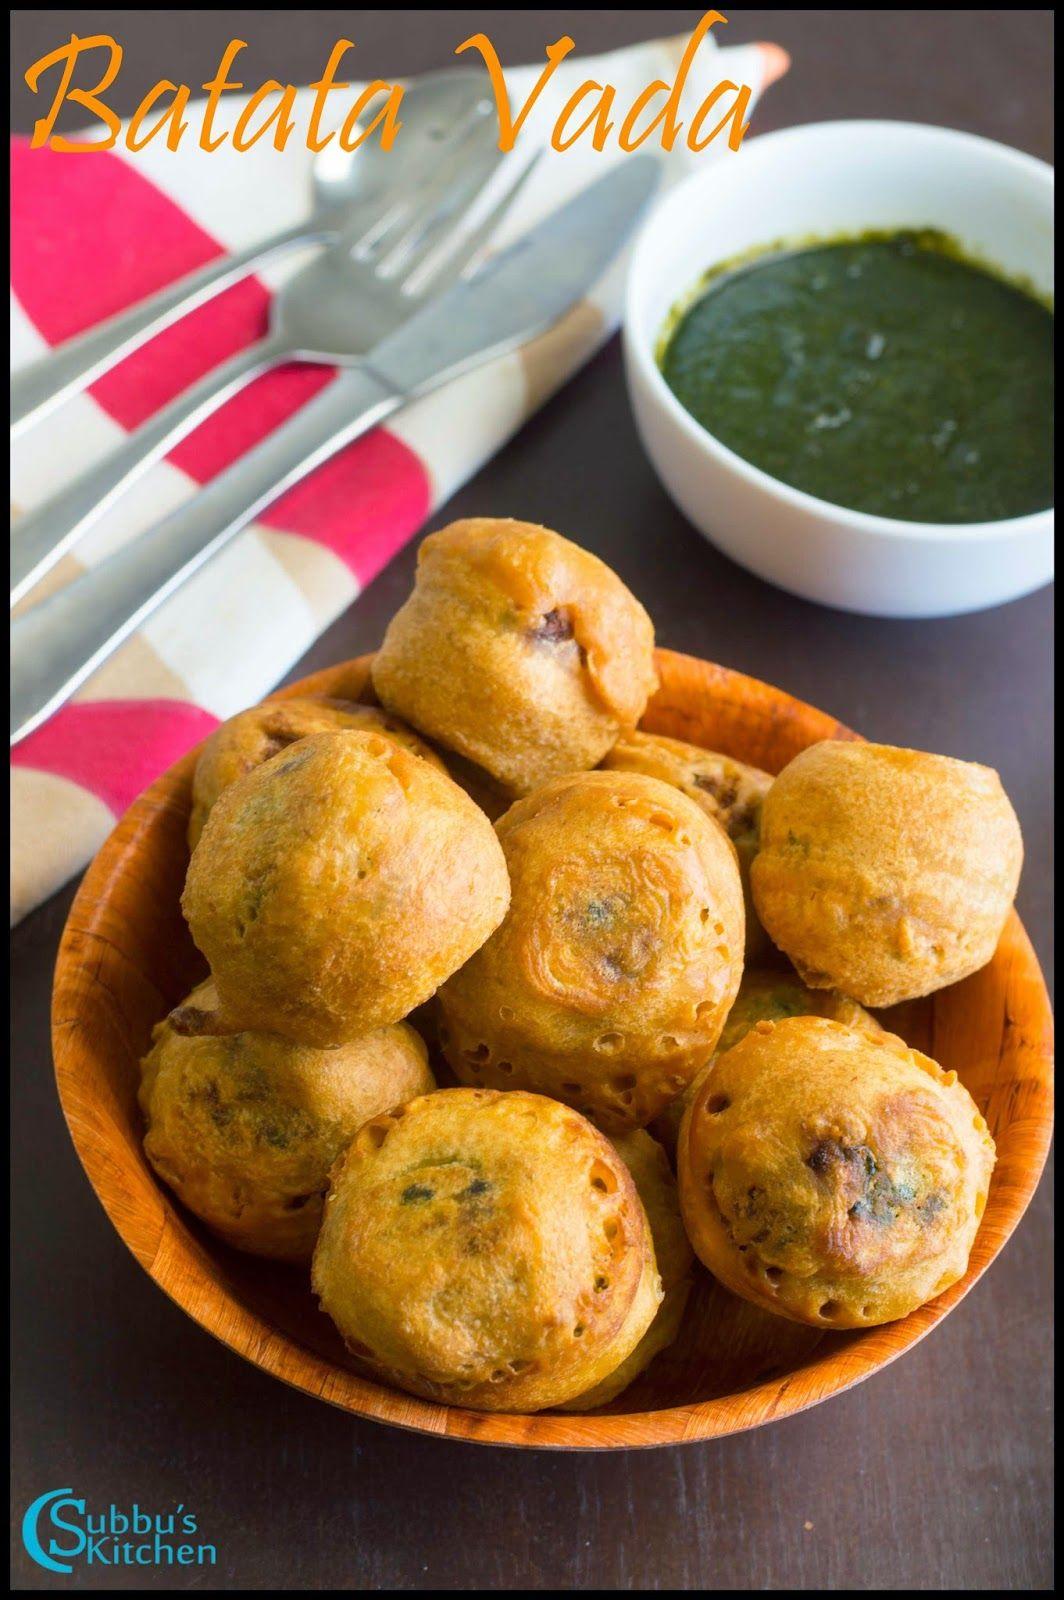 Batata Vada Recipe | Iftar recipes, Batata vada, Aloo bonda